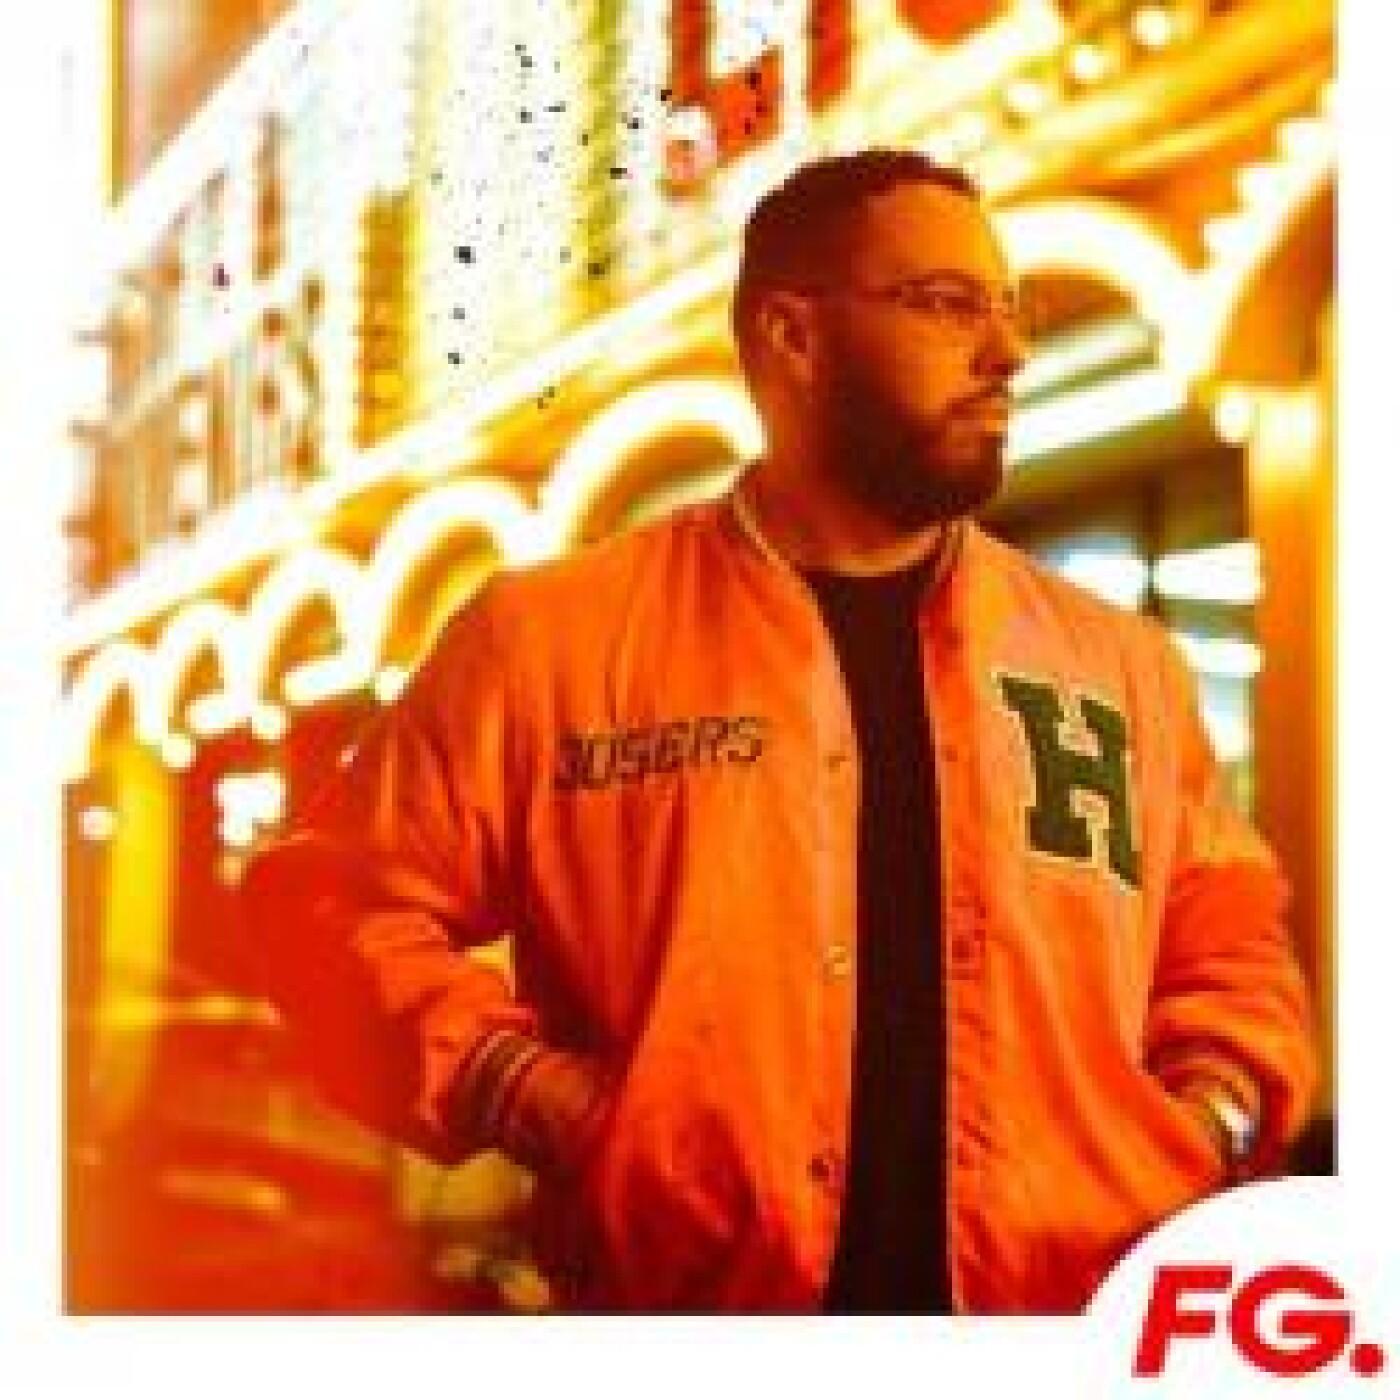 CLUB FG : MERCER